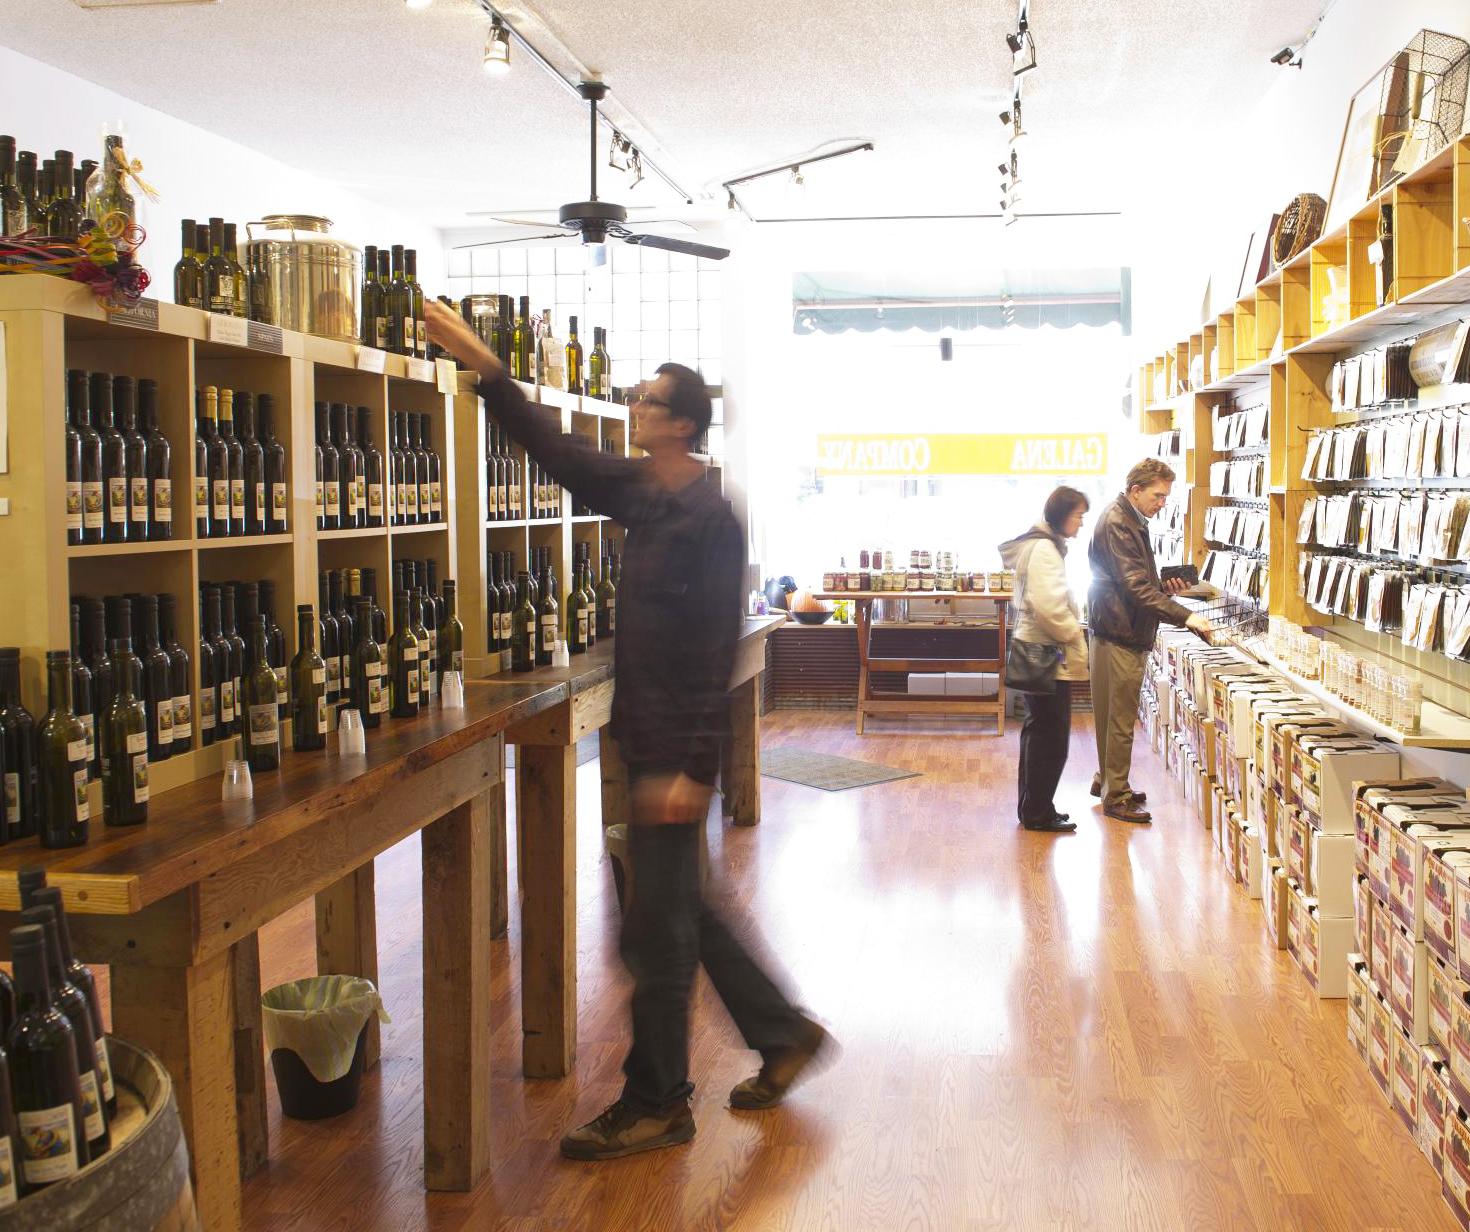 #3: Shops offer fun variety